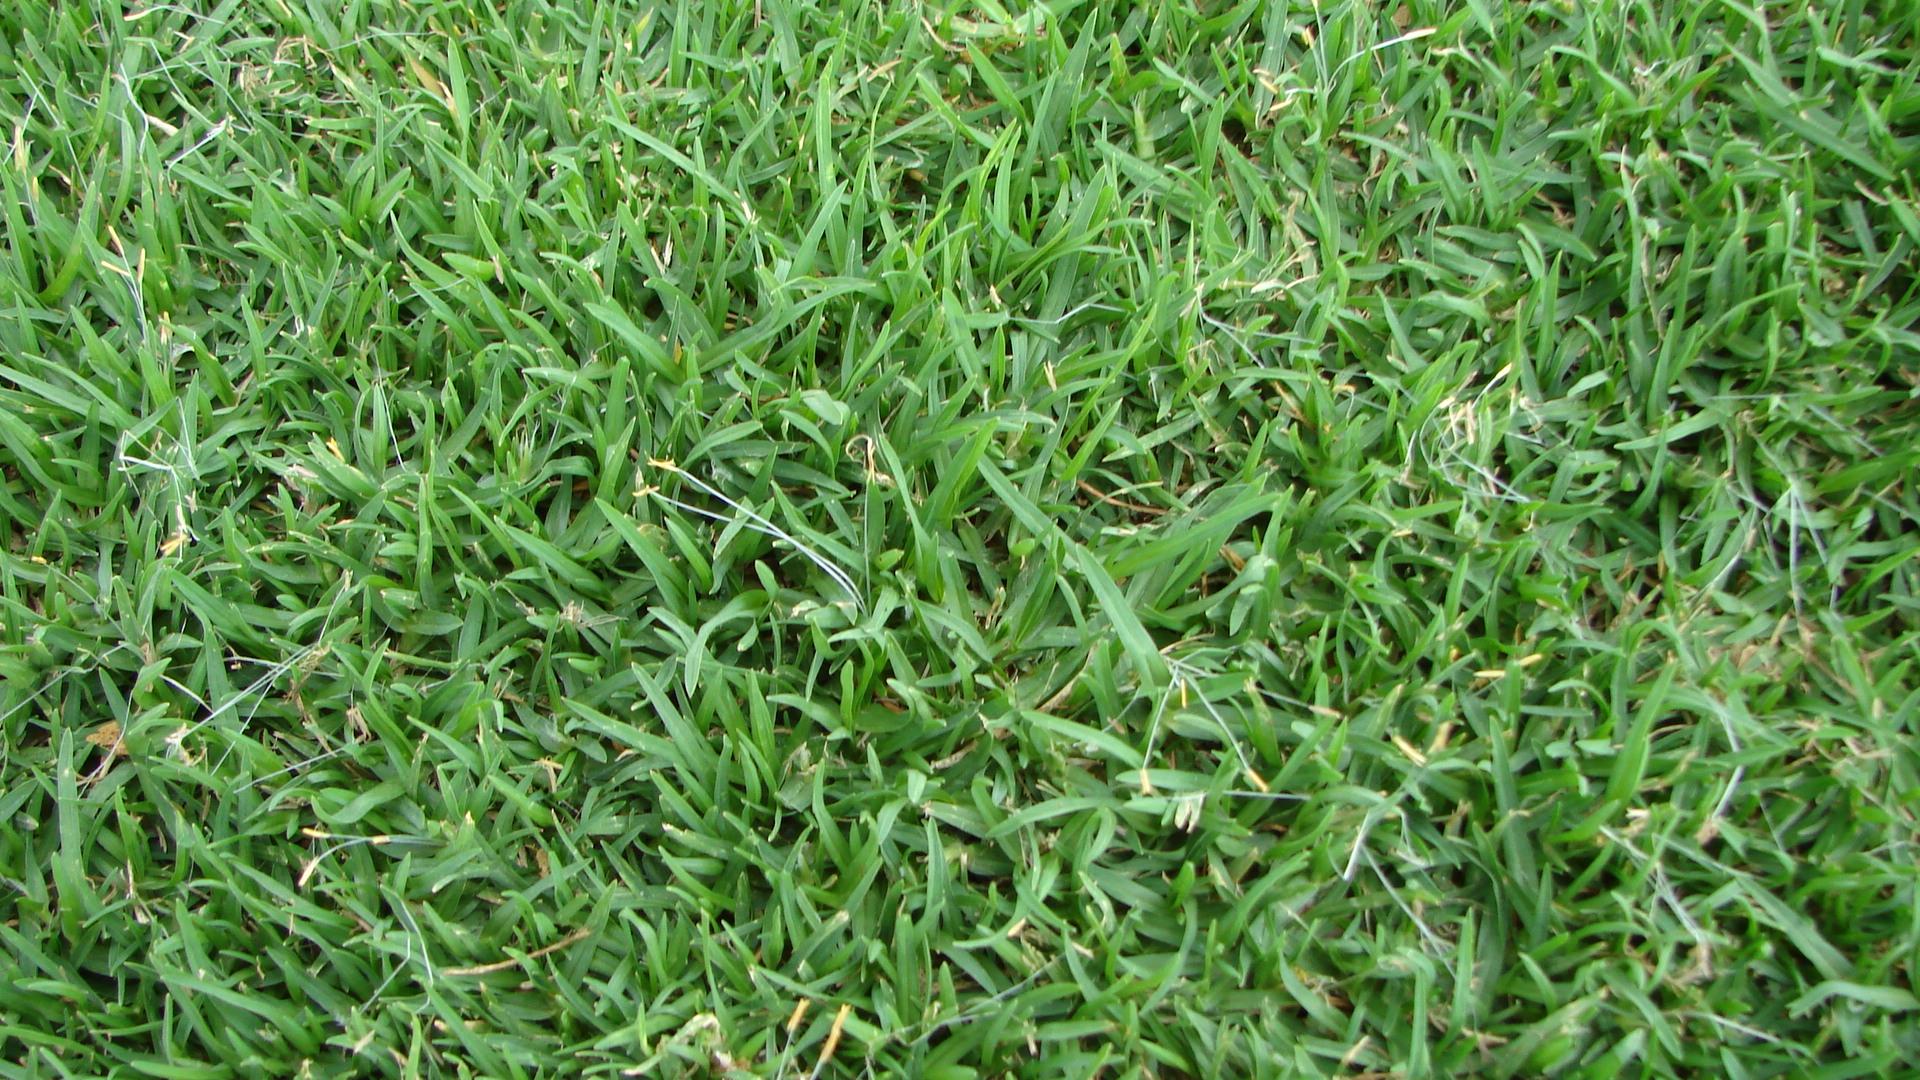 La rural semiller a semillas de c sped kikuyo la rural - Semillas de cesped para jardin ...